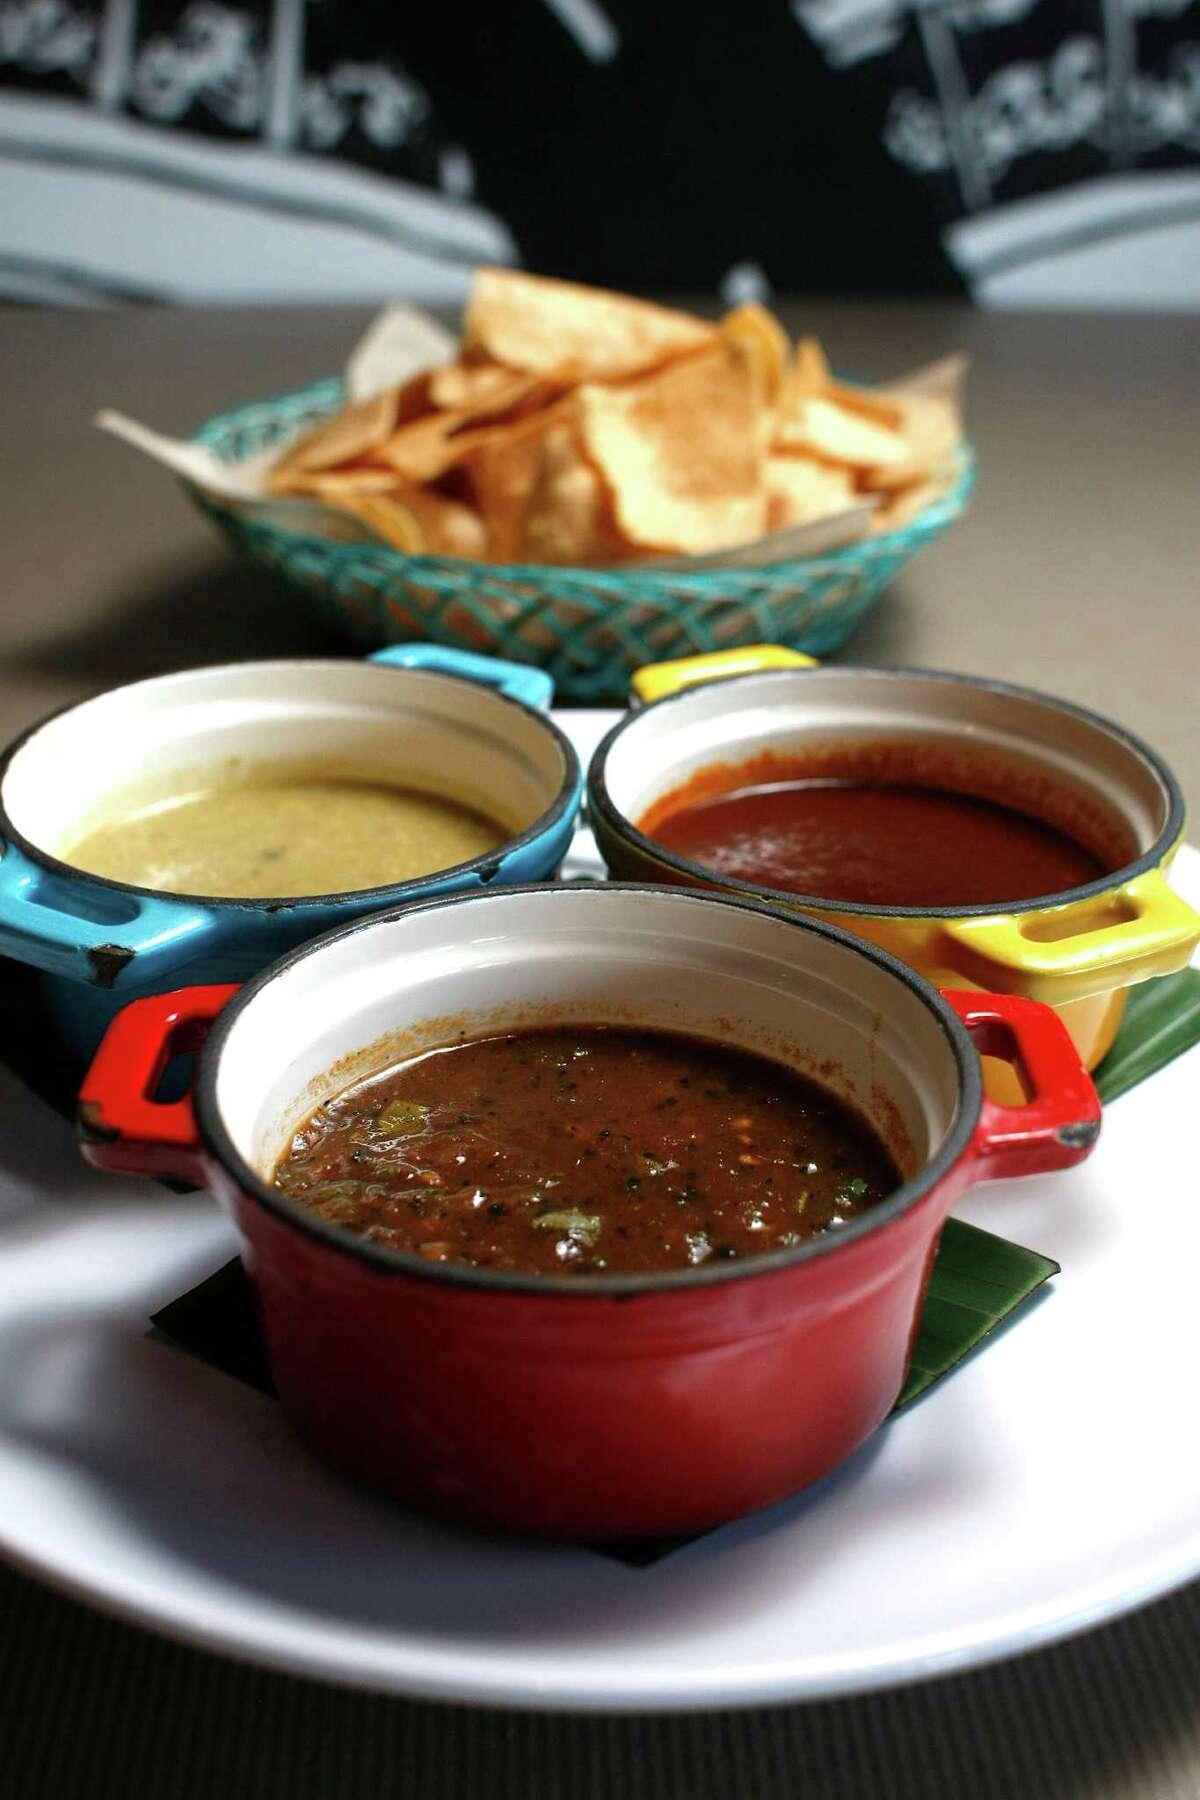 Trio of salsa at Cuchara